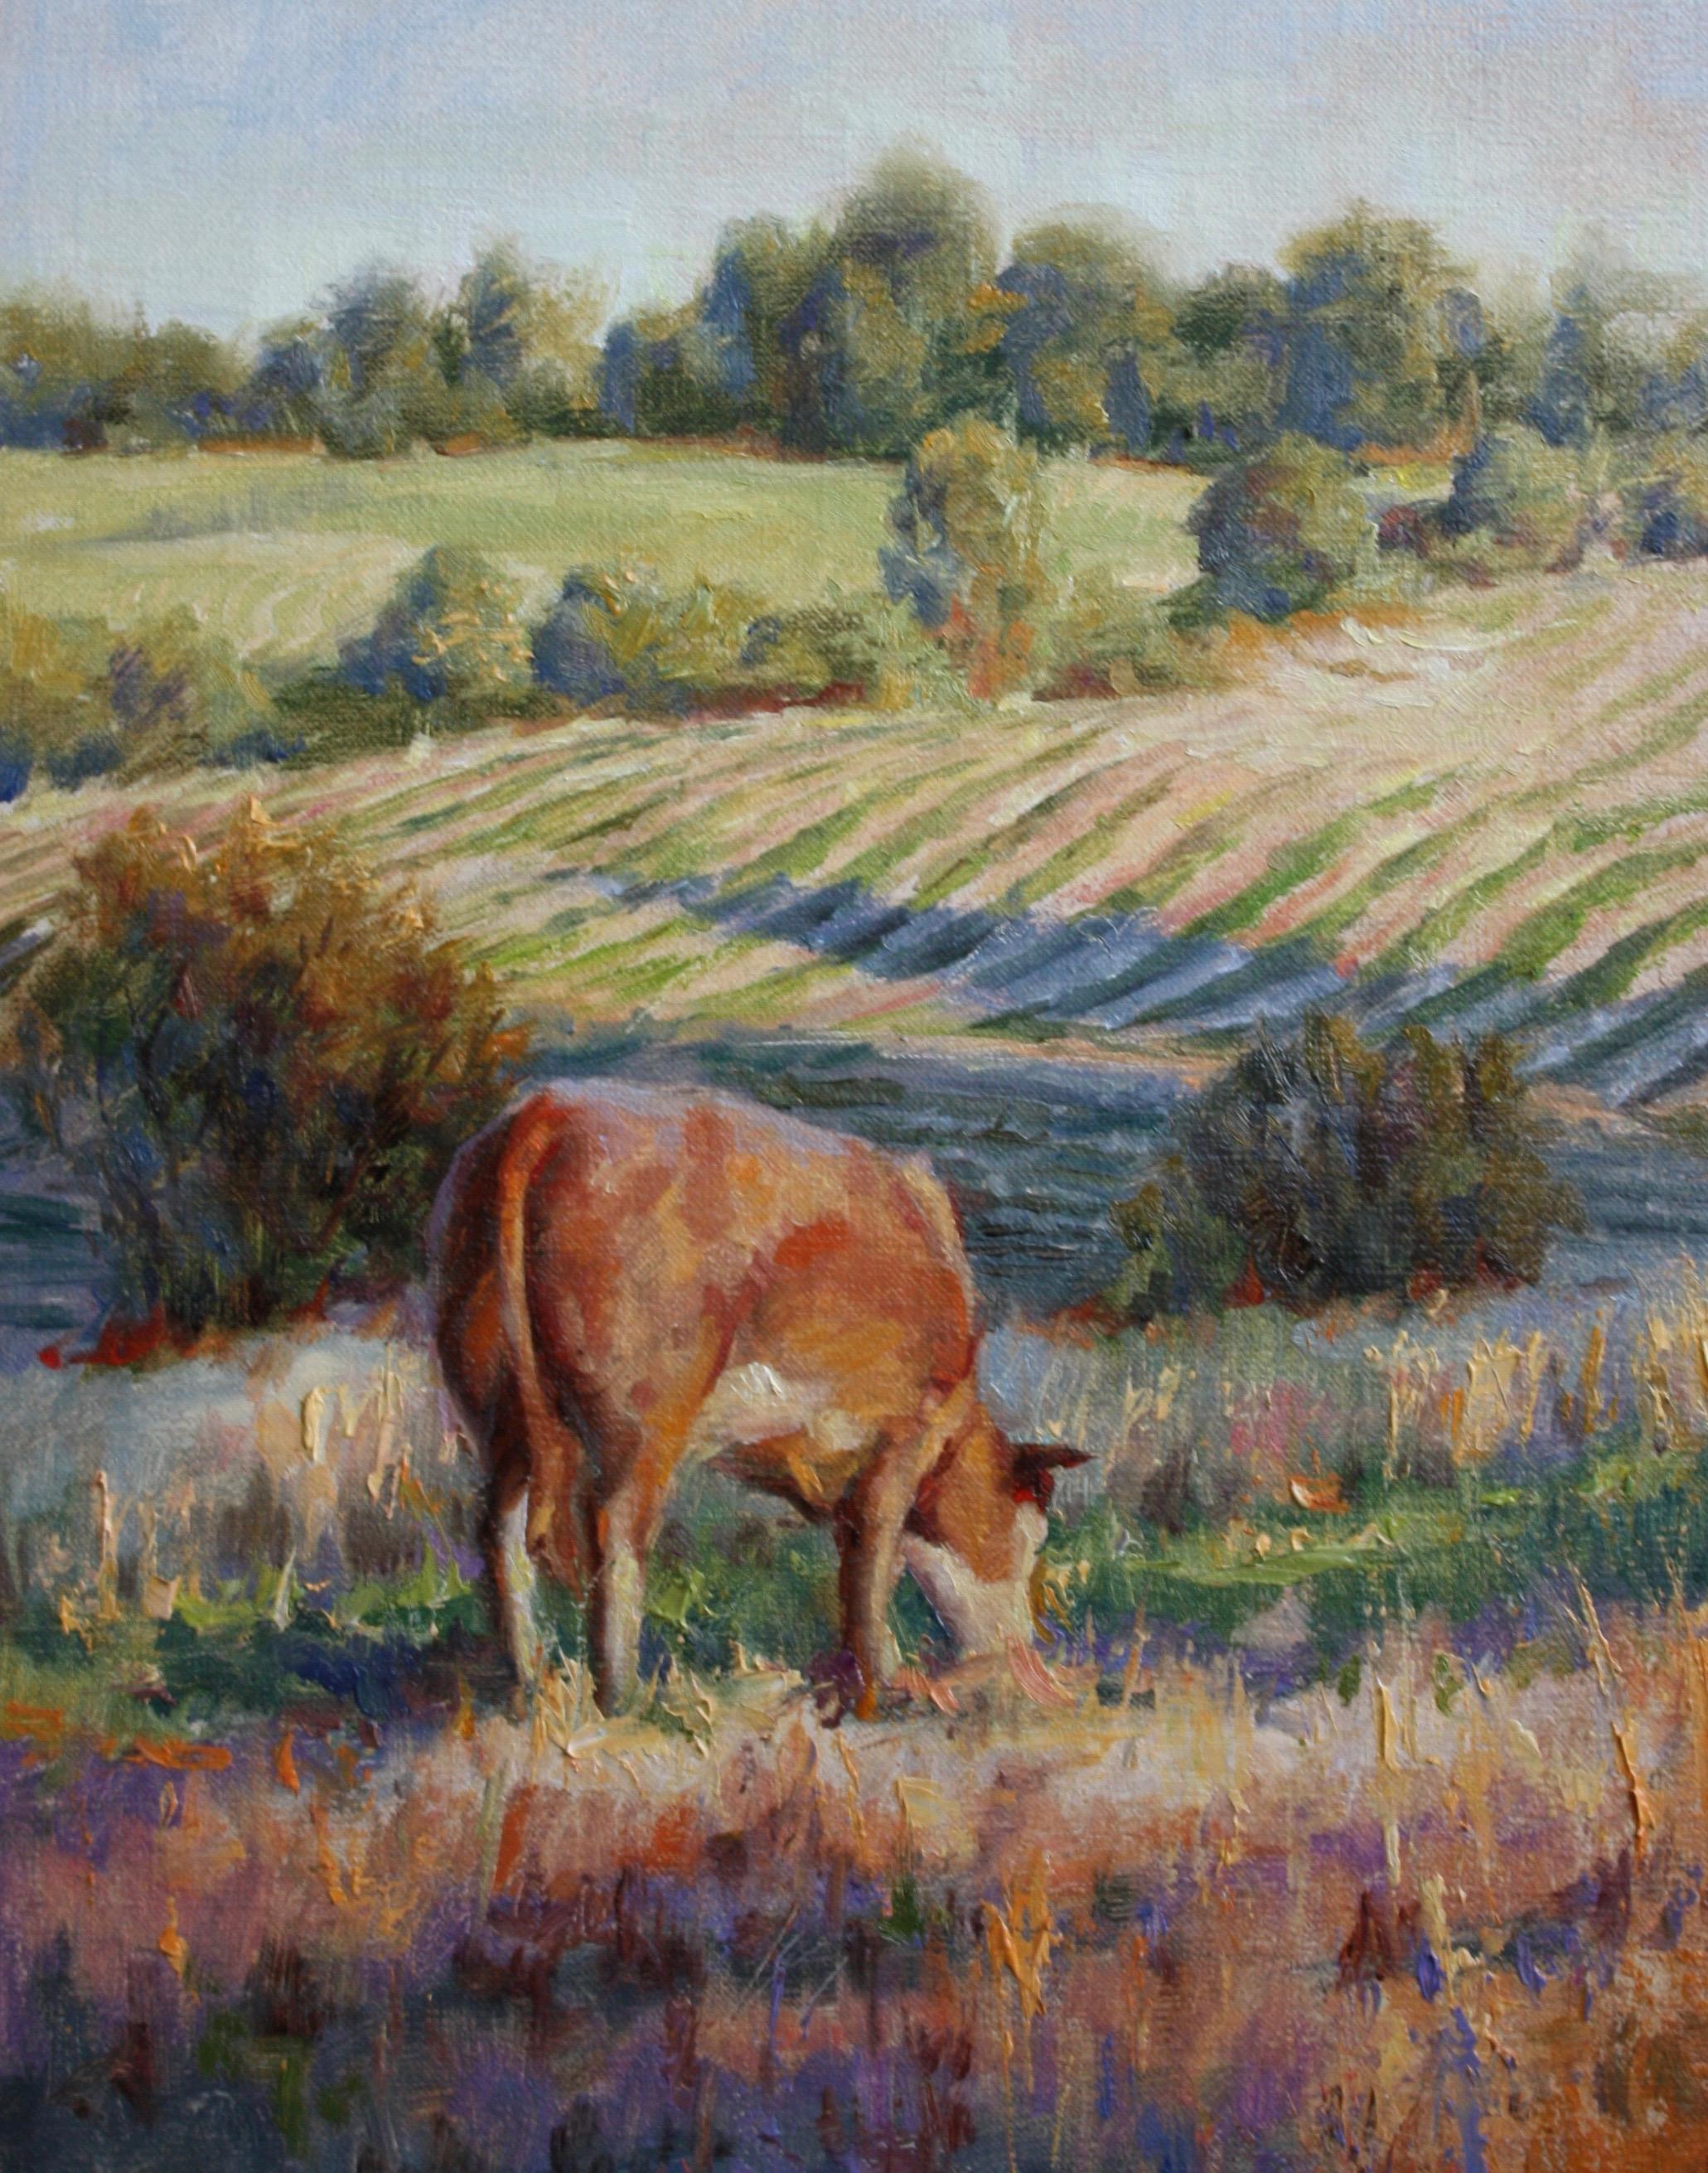 Back Pasture 11.25x8.5 $400